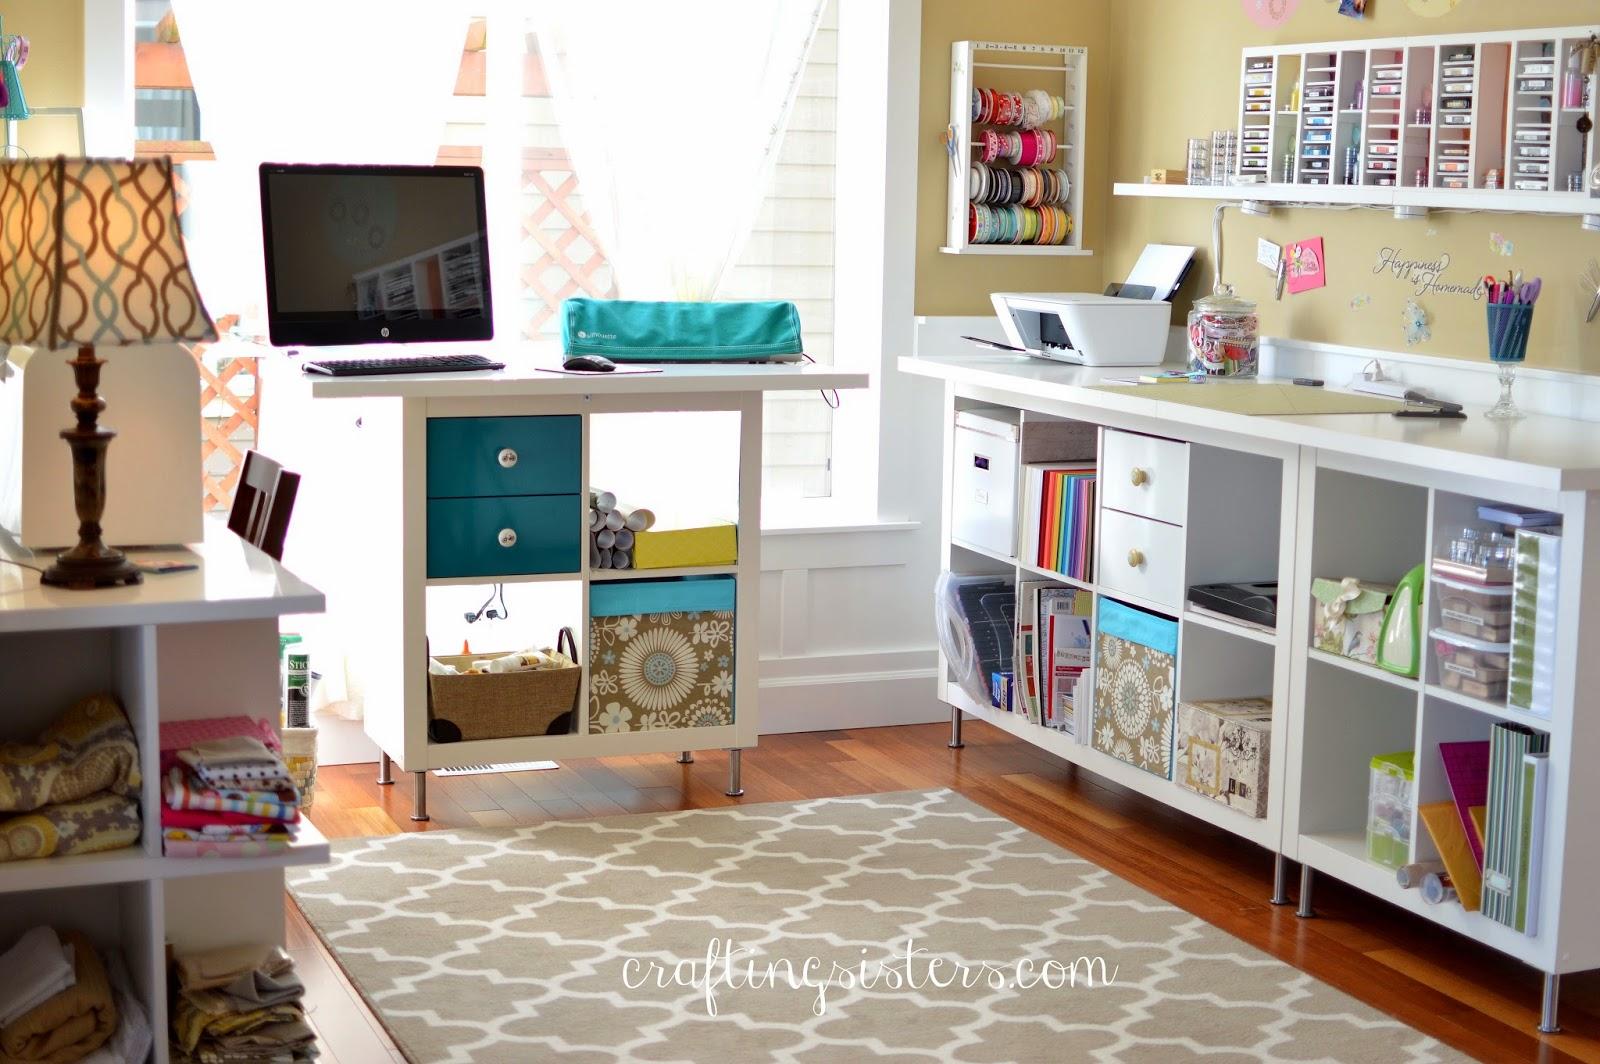 Dining room as Craft room